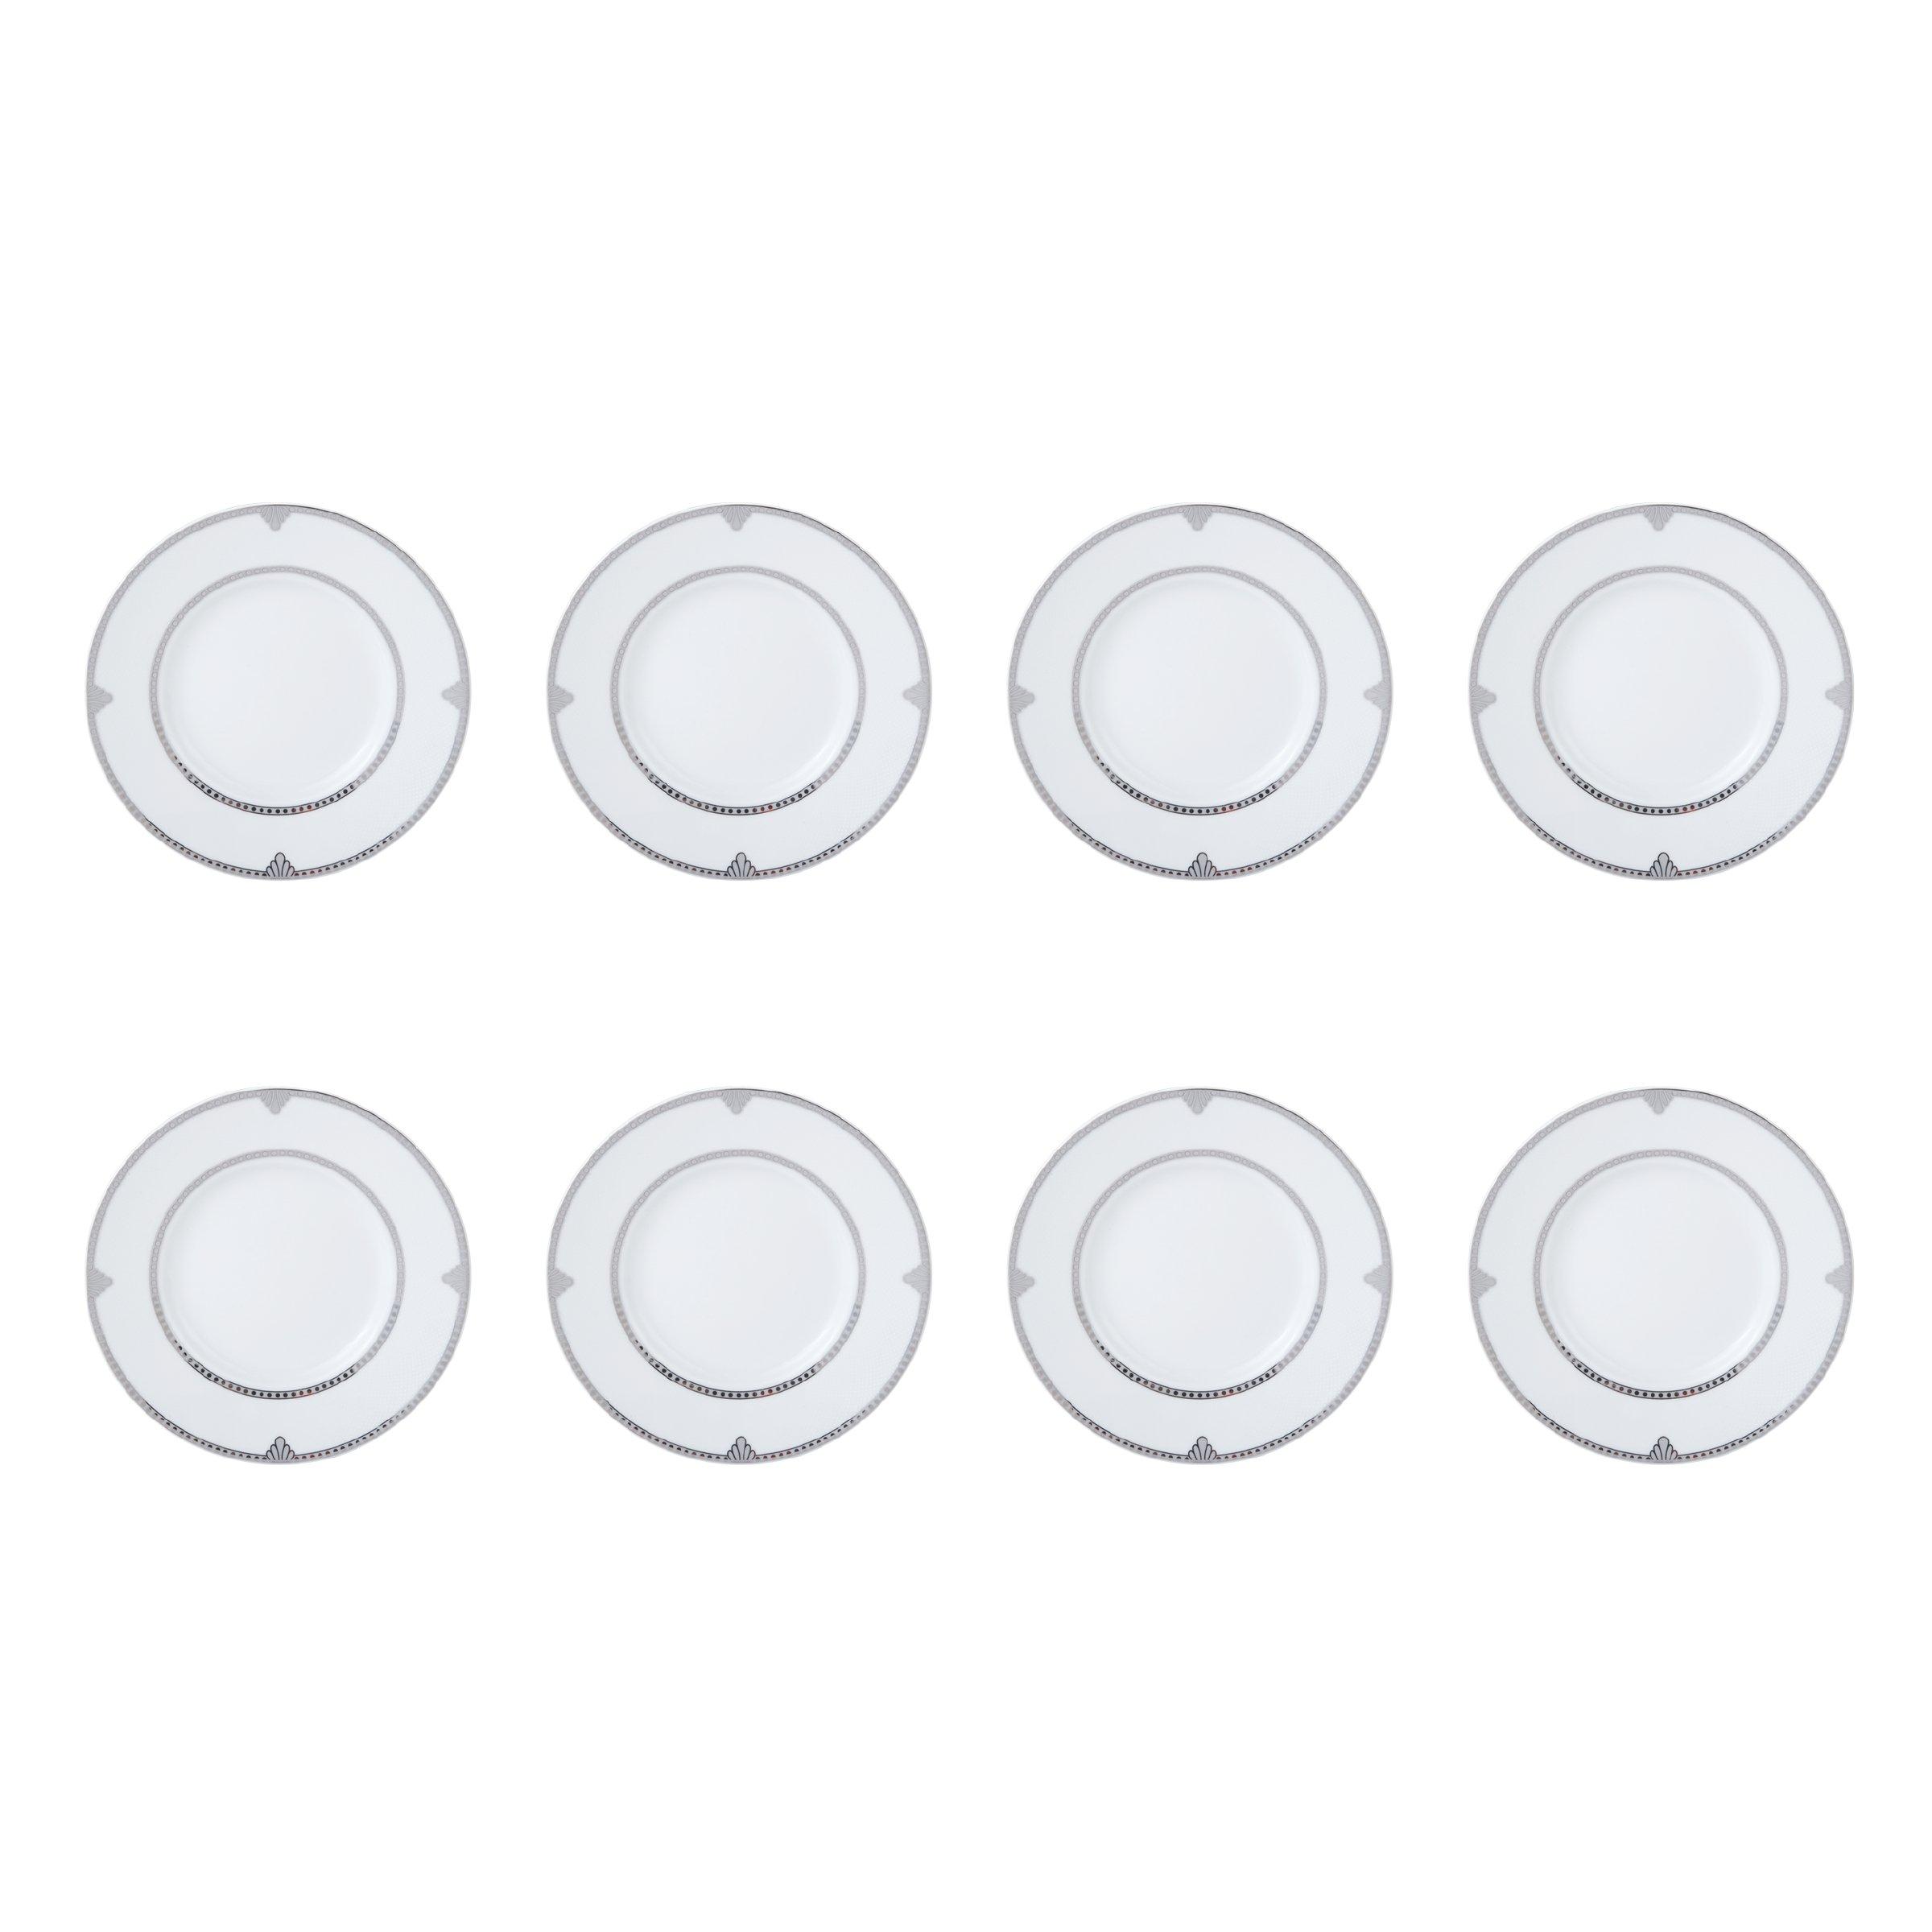 Mikasa Regent Bead 40-Piece Porcelain Dinnerware Set, Service for 8 by Mikasa (Image #6)